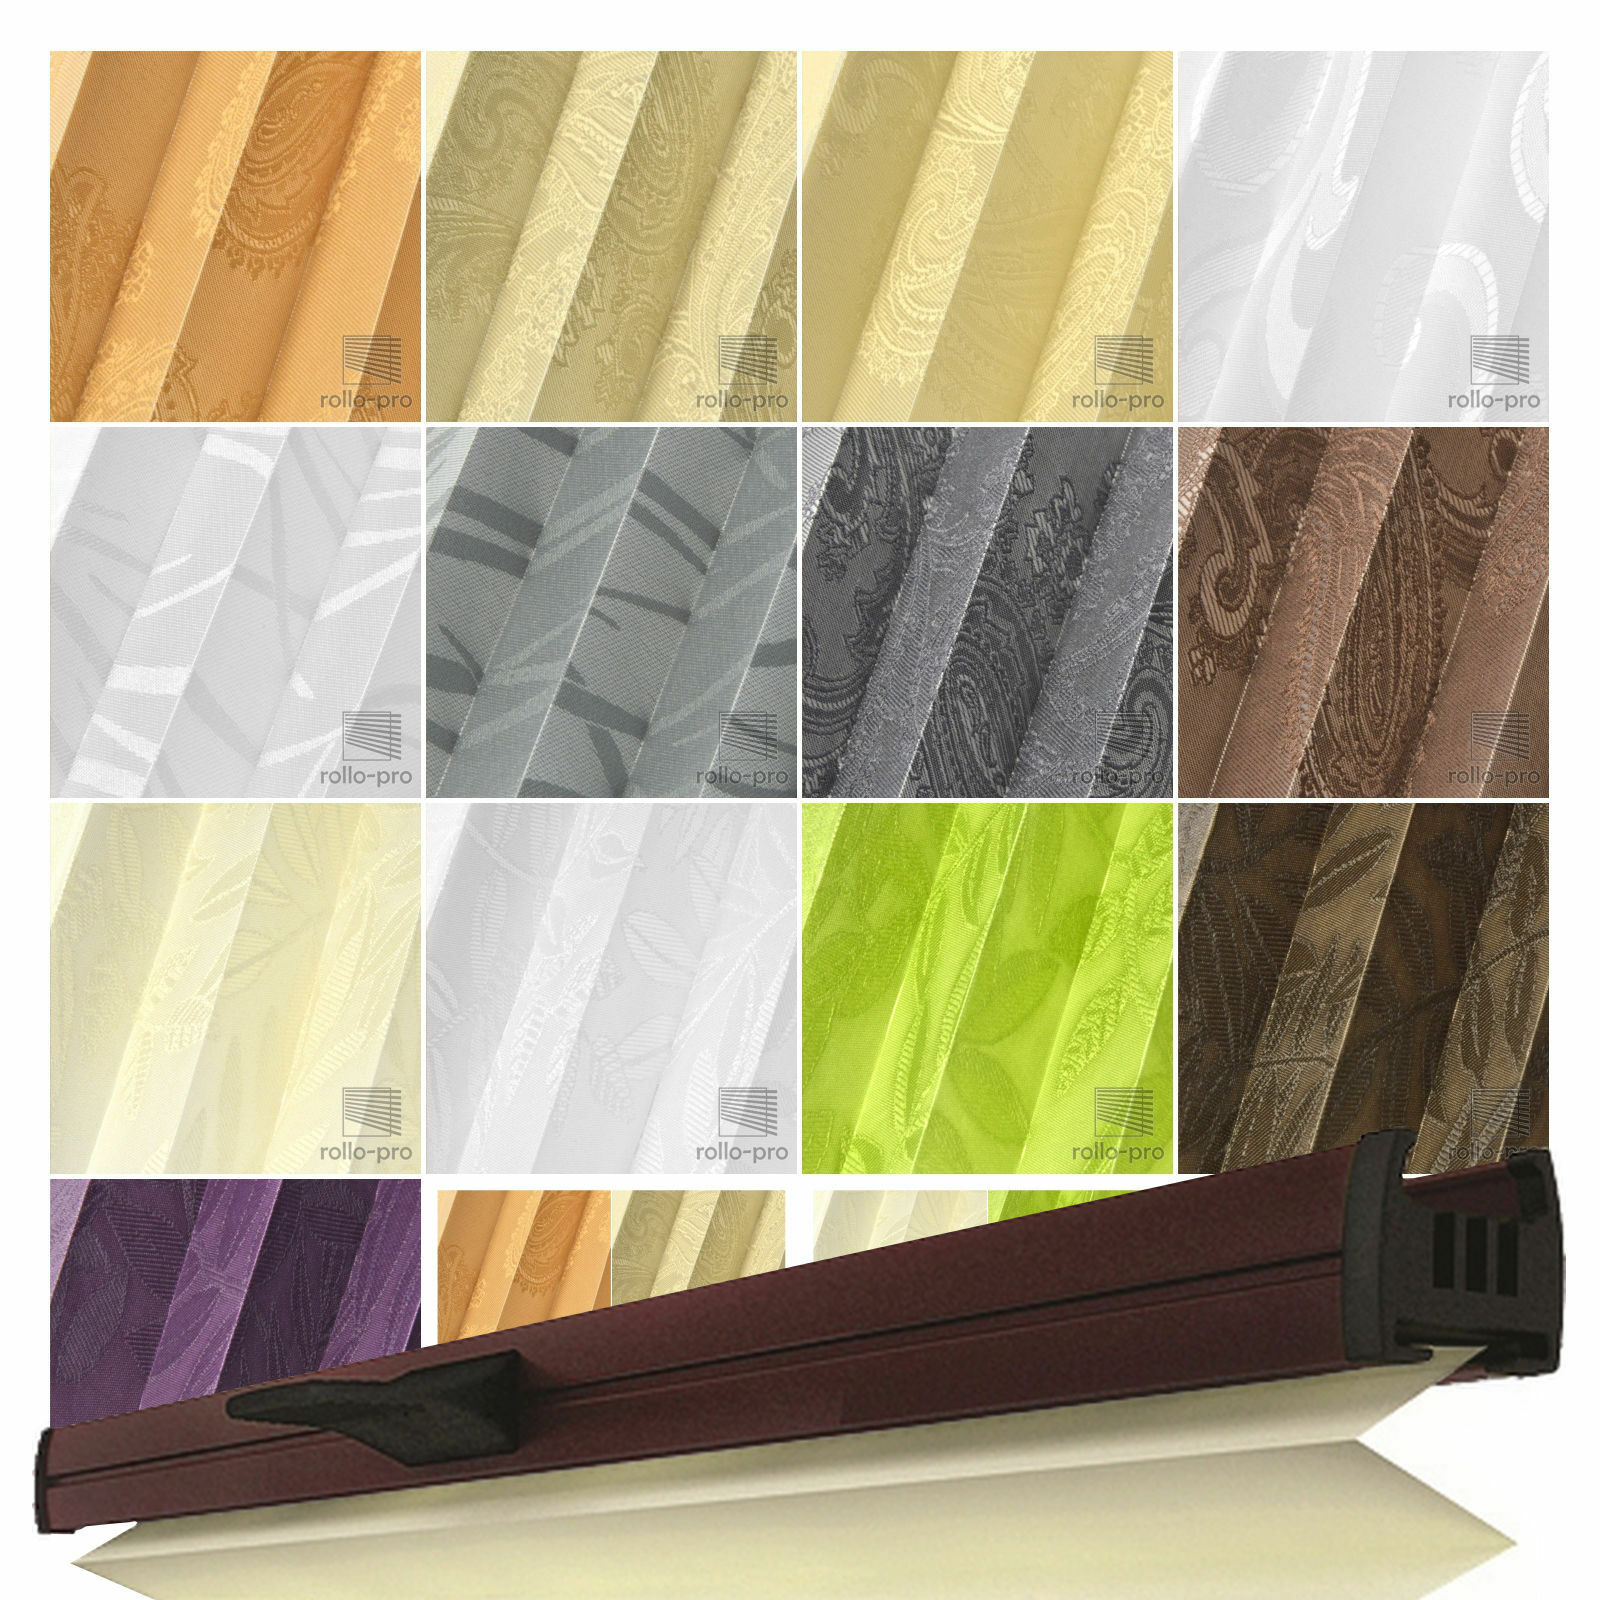 Plissee Faltrollo Faltrollo Faltrollo nach Maß ►FIGURADO Profil Braun ►Rollos Plissees Jalousien   Tragen-wider  0b356e